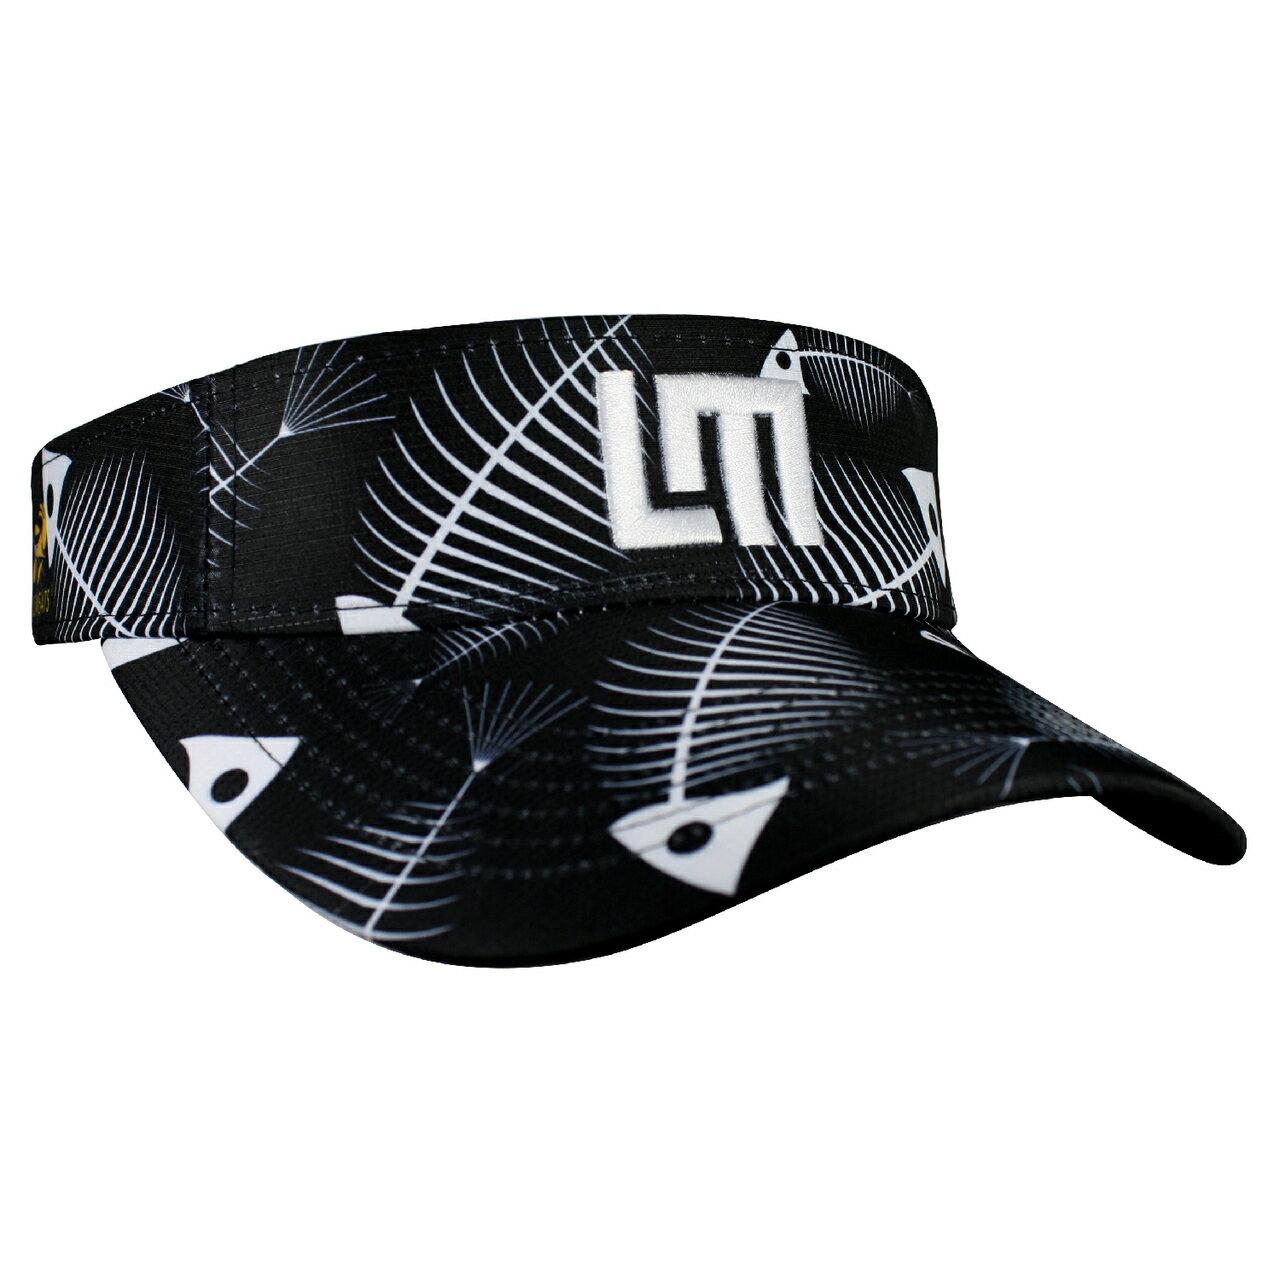 LOUDMOUTH 英國高爾夫服飾品牌-骨魚中空帽